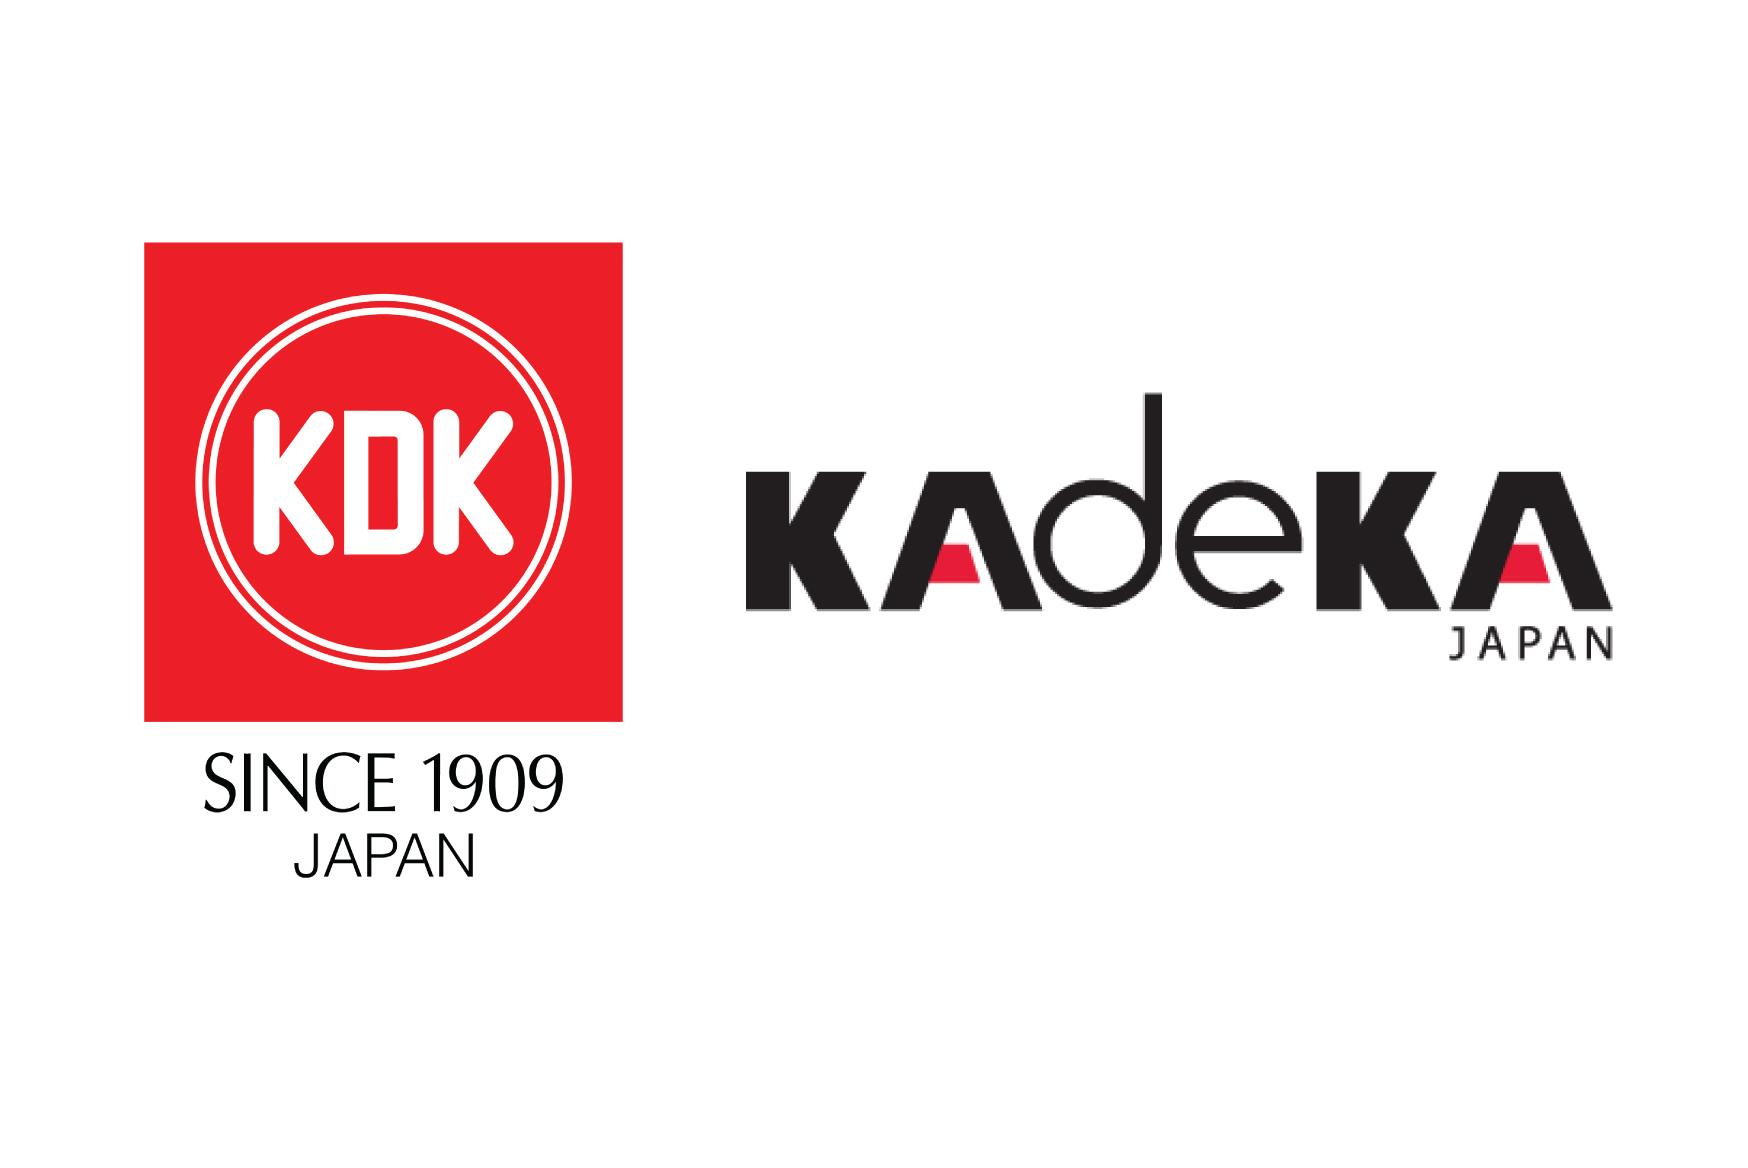 KDK & KADEKA